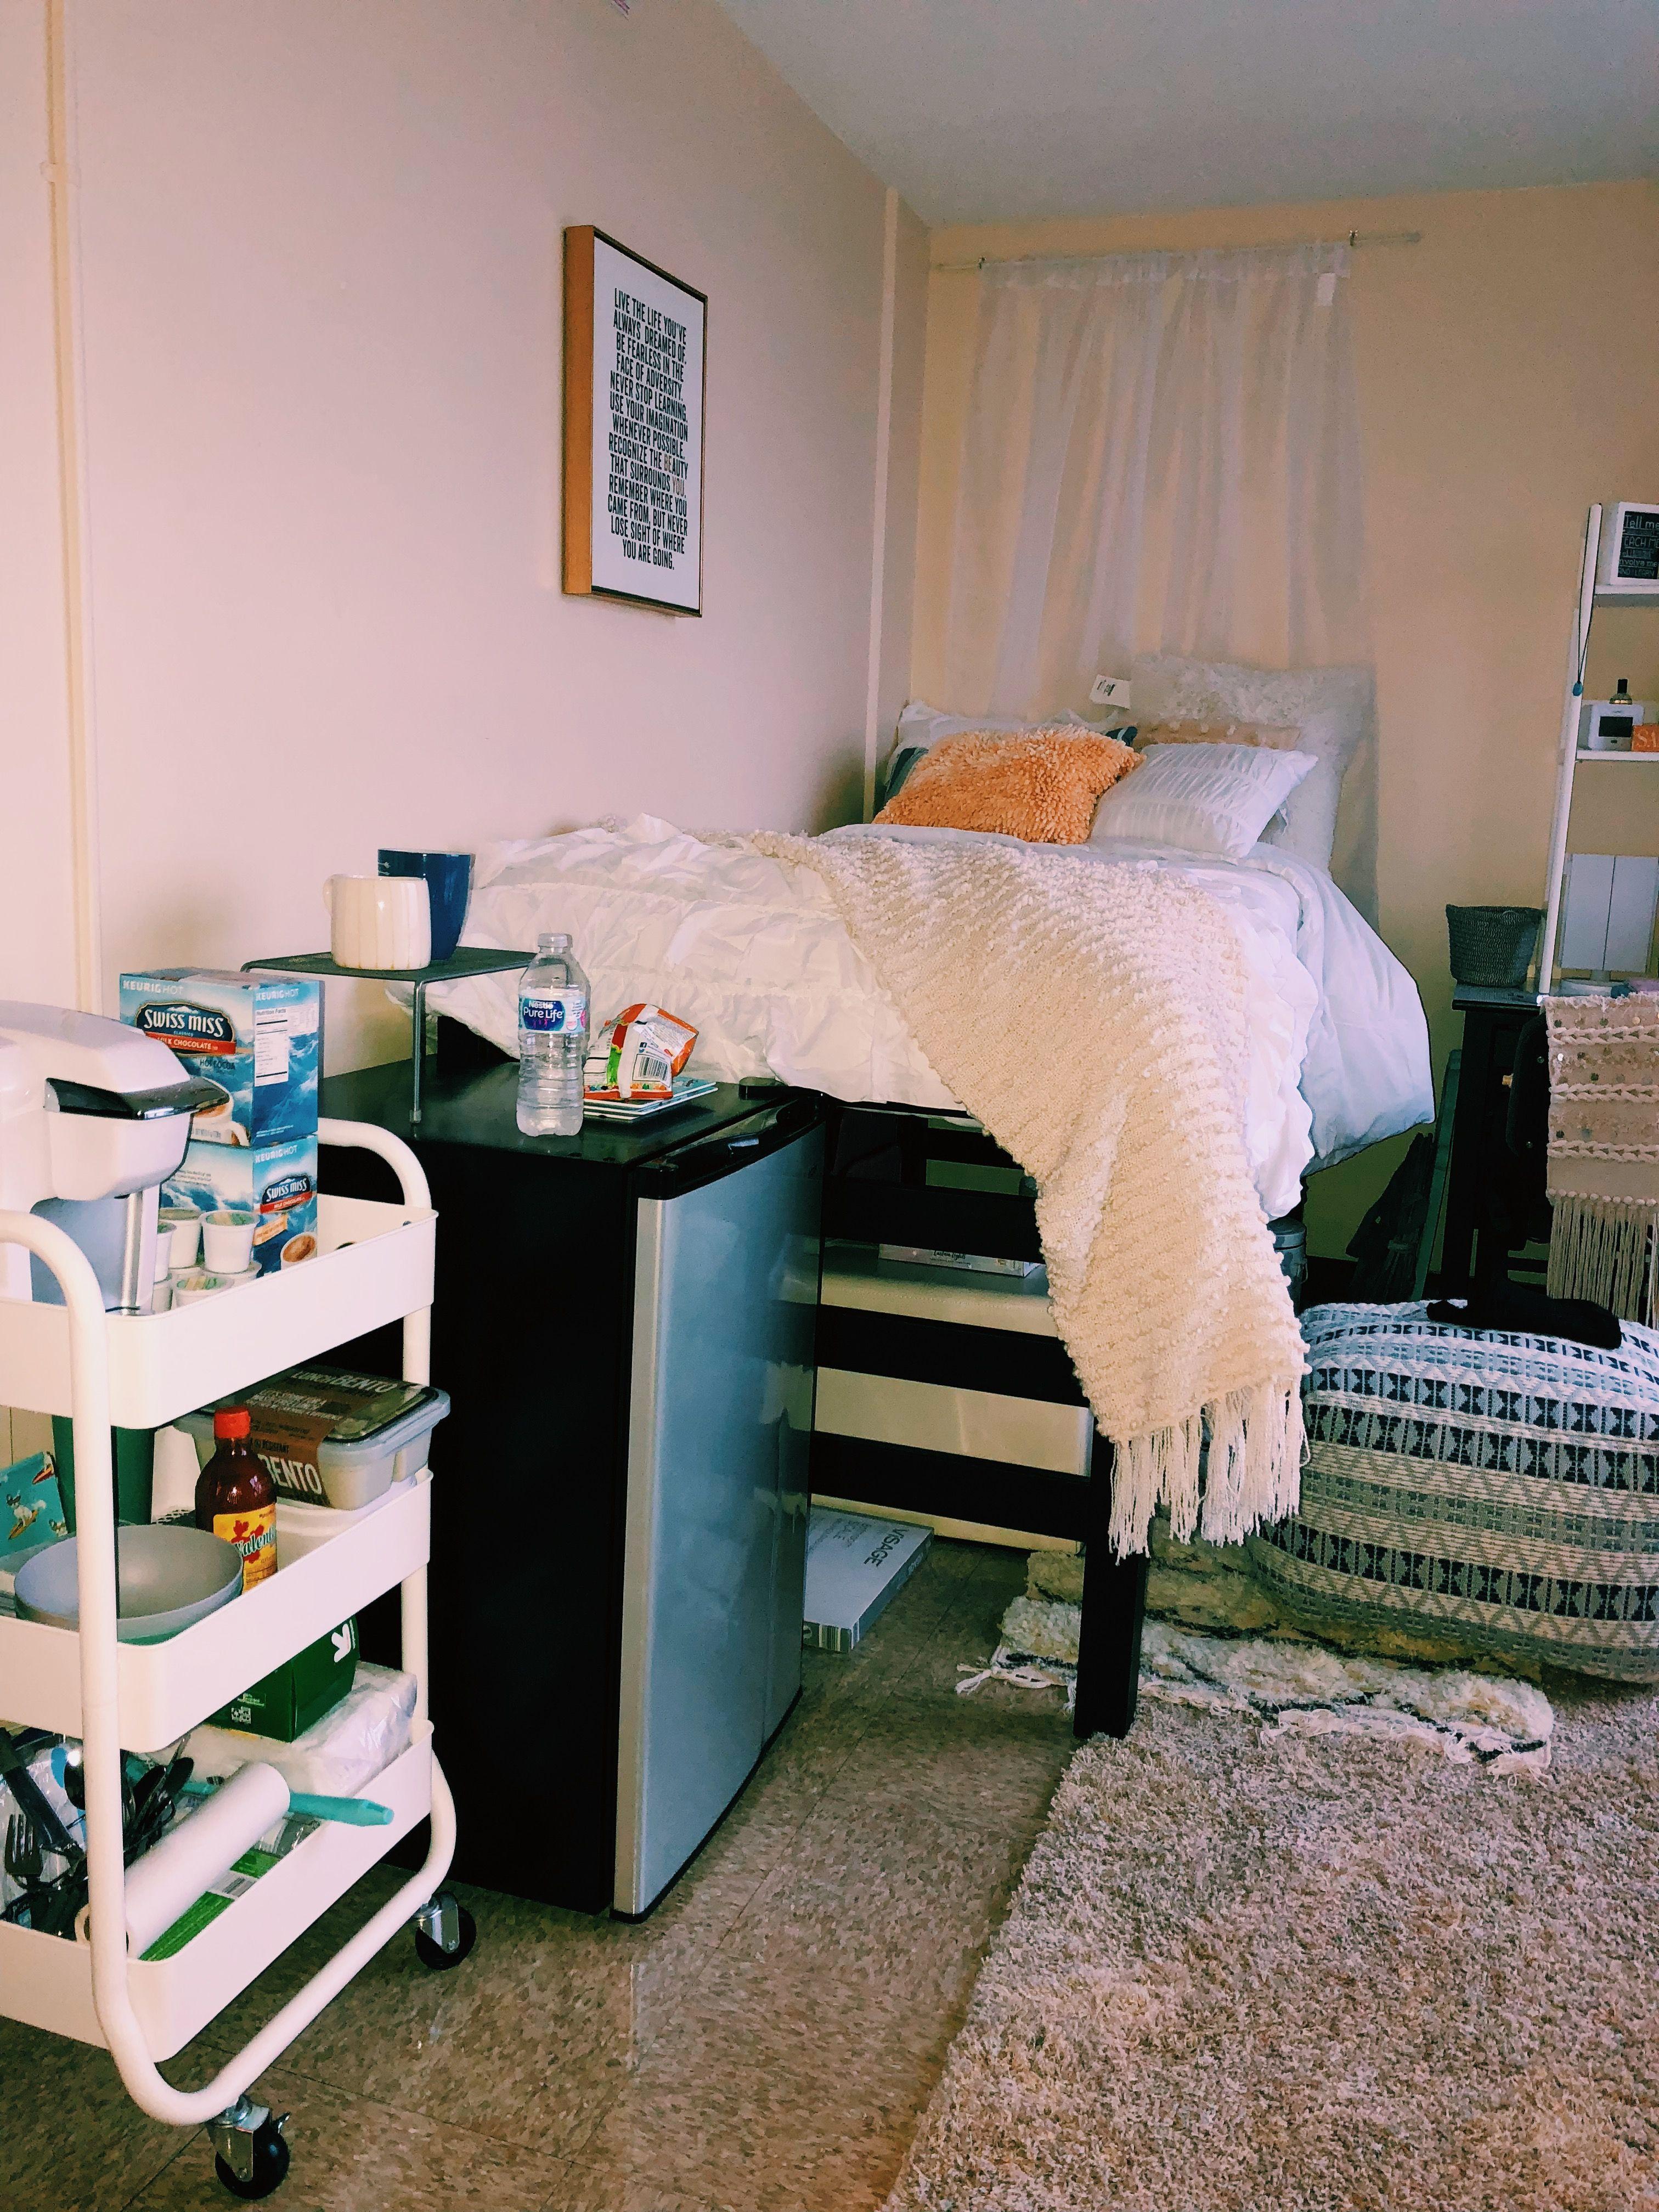 Dorm Room At Illinois State University Girls Dorm Room College Dorm Room Decor Dorm Bedroom